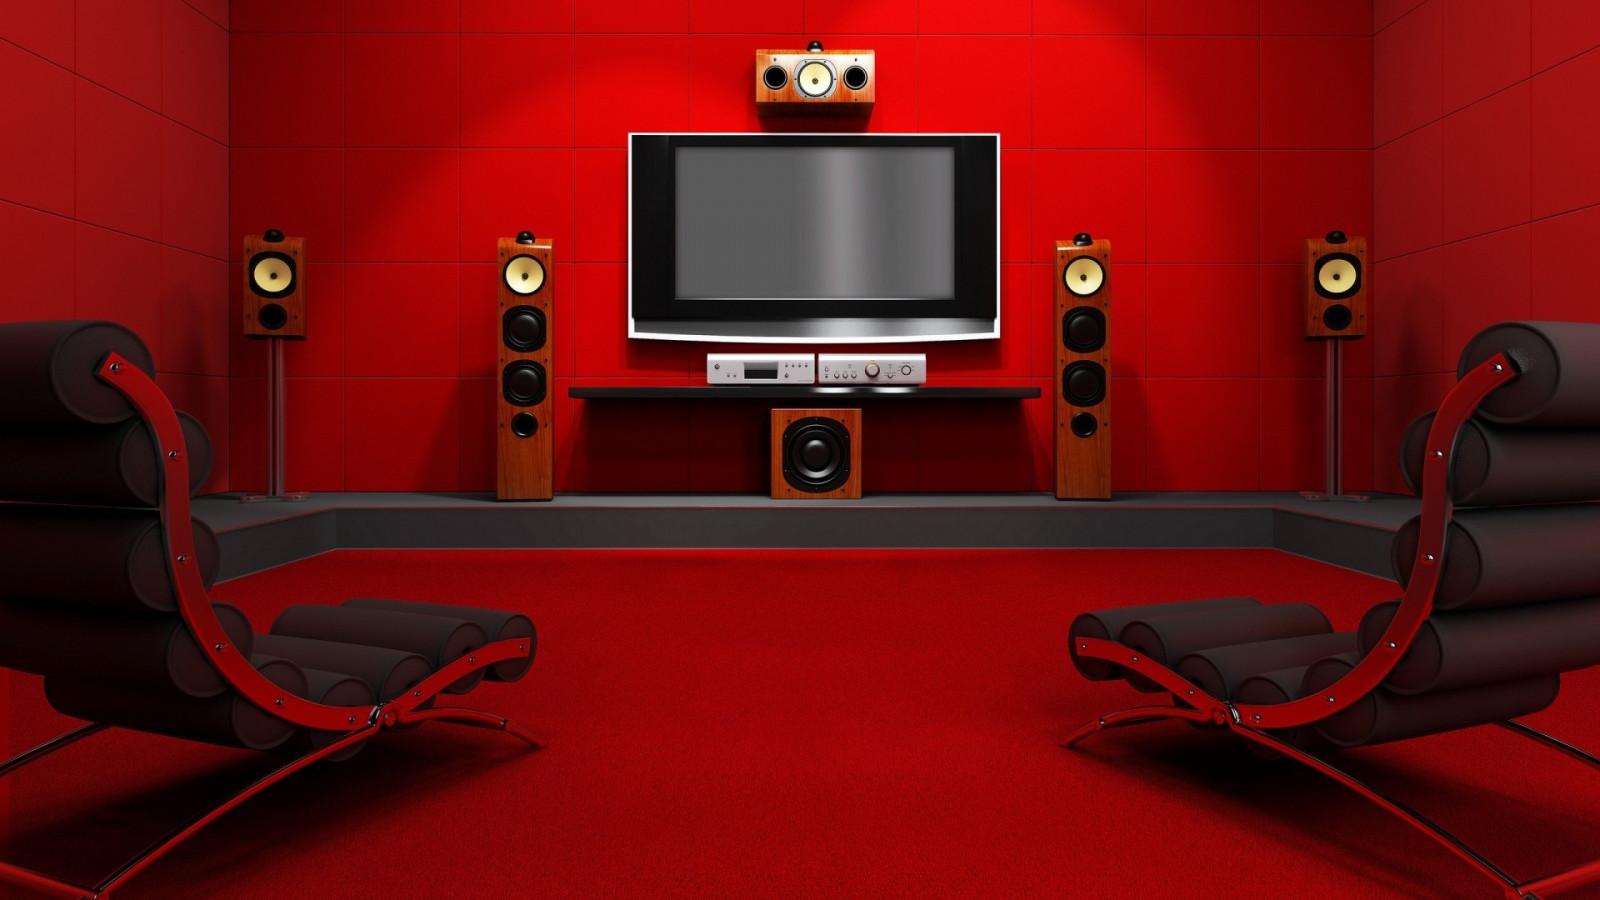 Wallpaper Red Indoors Chair Interior Design Television Sets Movie Theater B W Speakers Furniture Screenshot Living Room 1920x1080 Meelahi 186822 Hd Wallpapers Wallhere